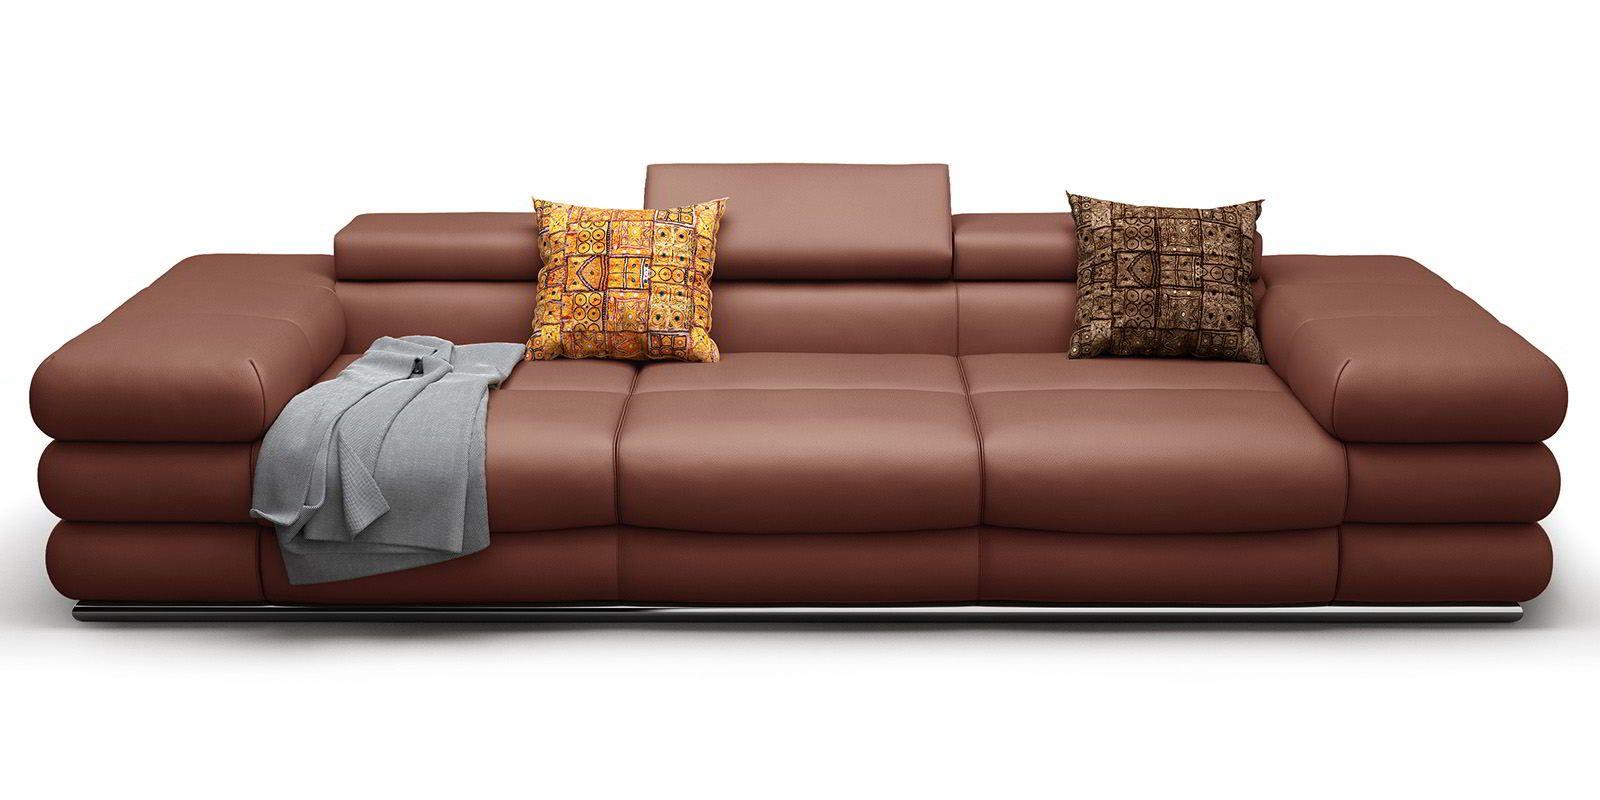 3 Sitzer Ledersofa Lyon Designer Couch Xxl Sofa Ledersofa Sofa